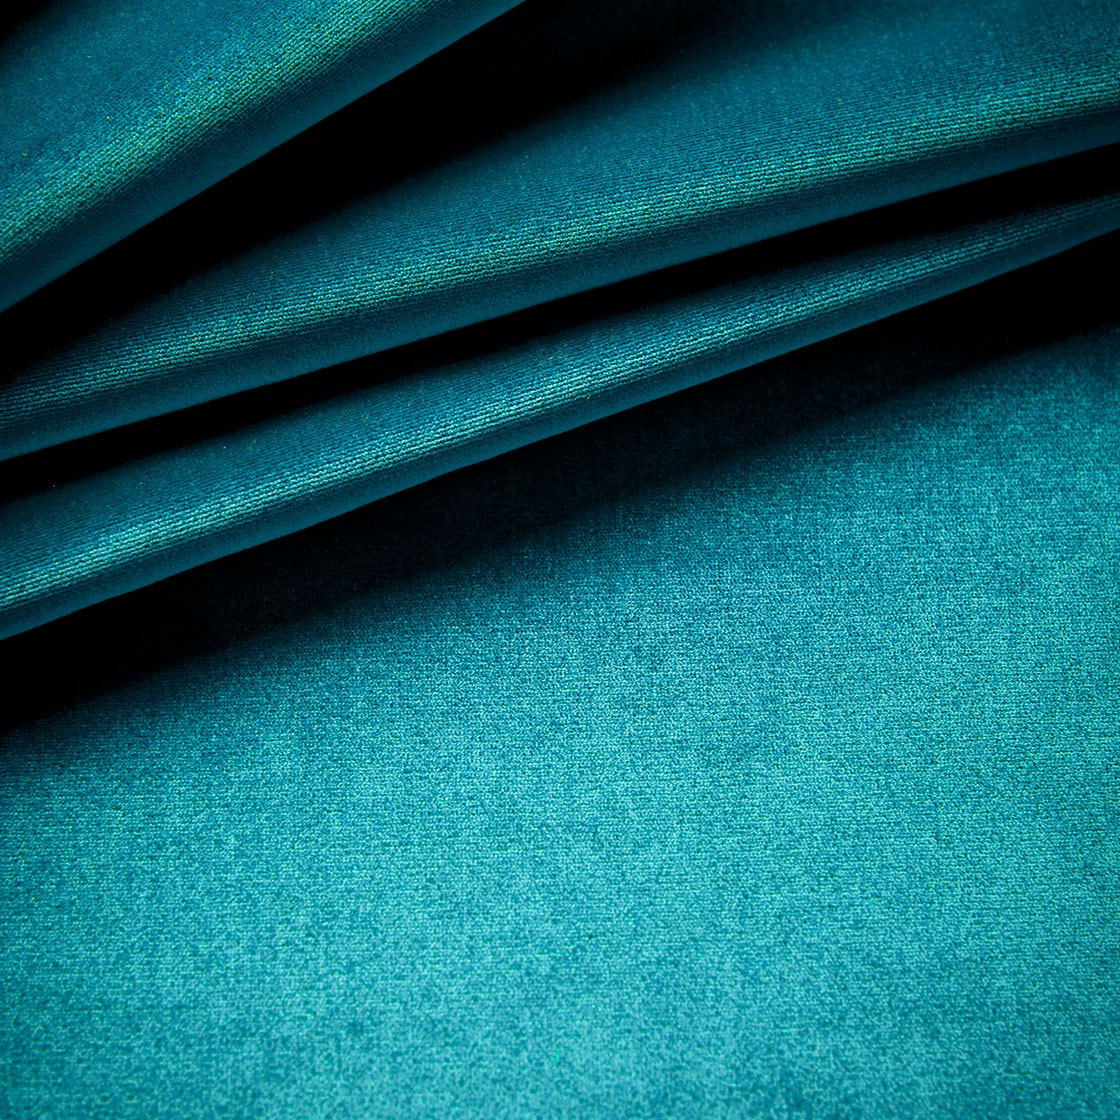 Capri Silk Velvet - Aquamarine - Beaumont & Fletcher - Beaumont & Fletcher